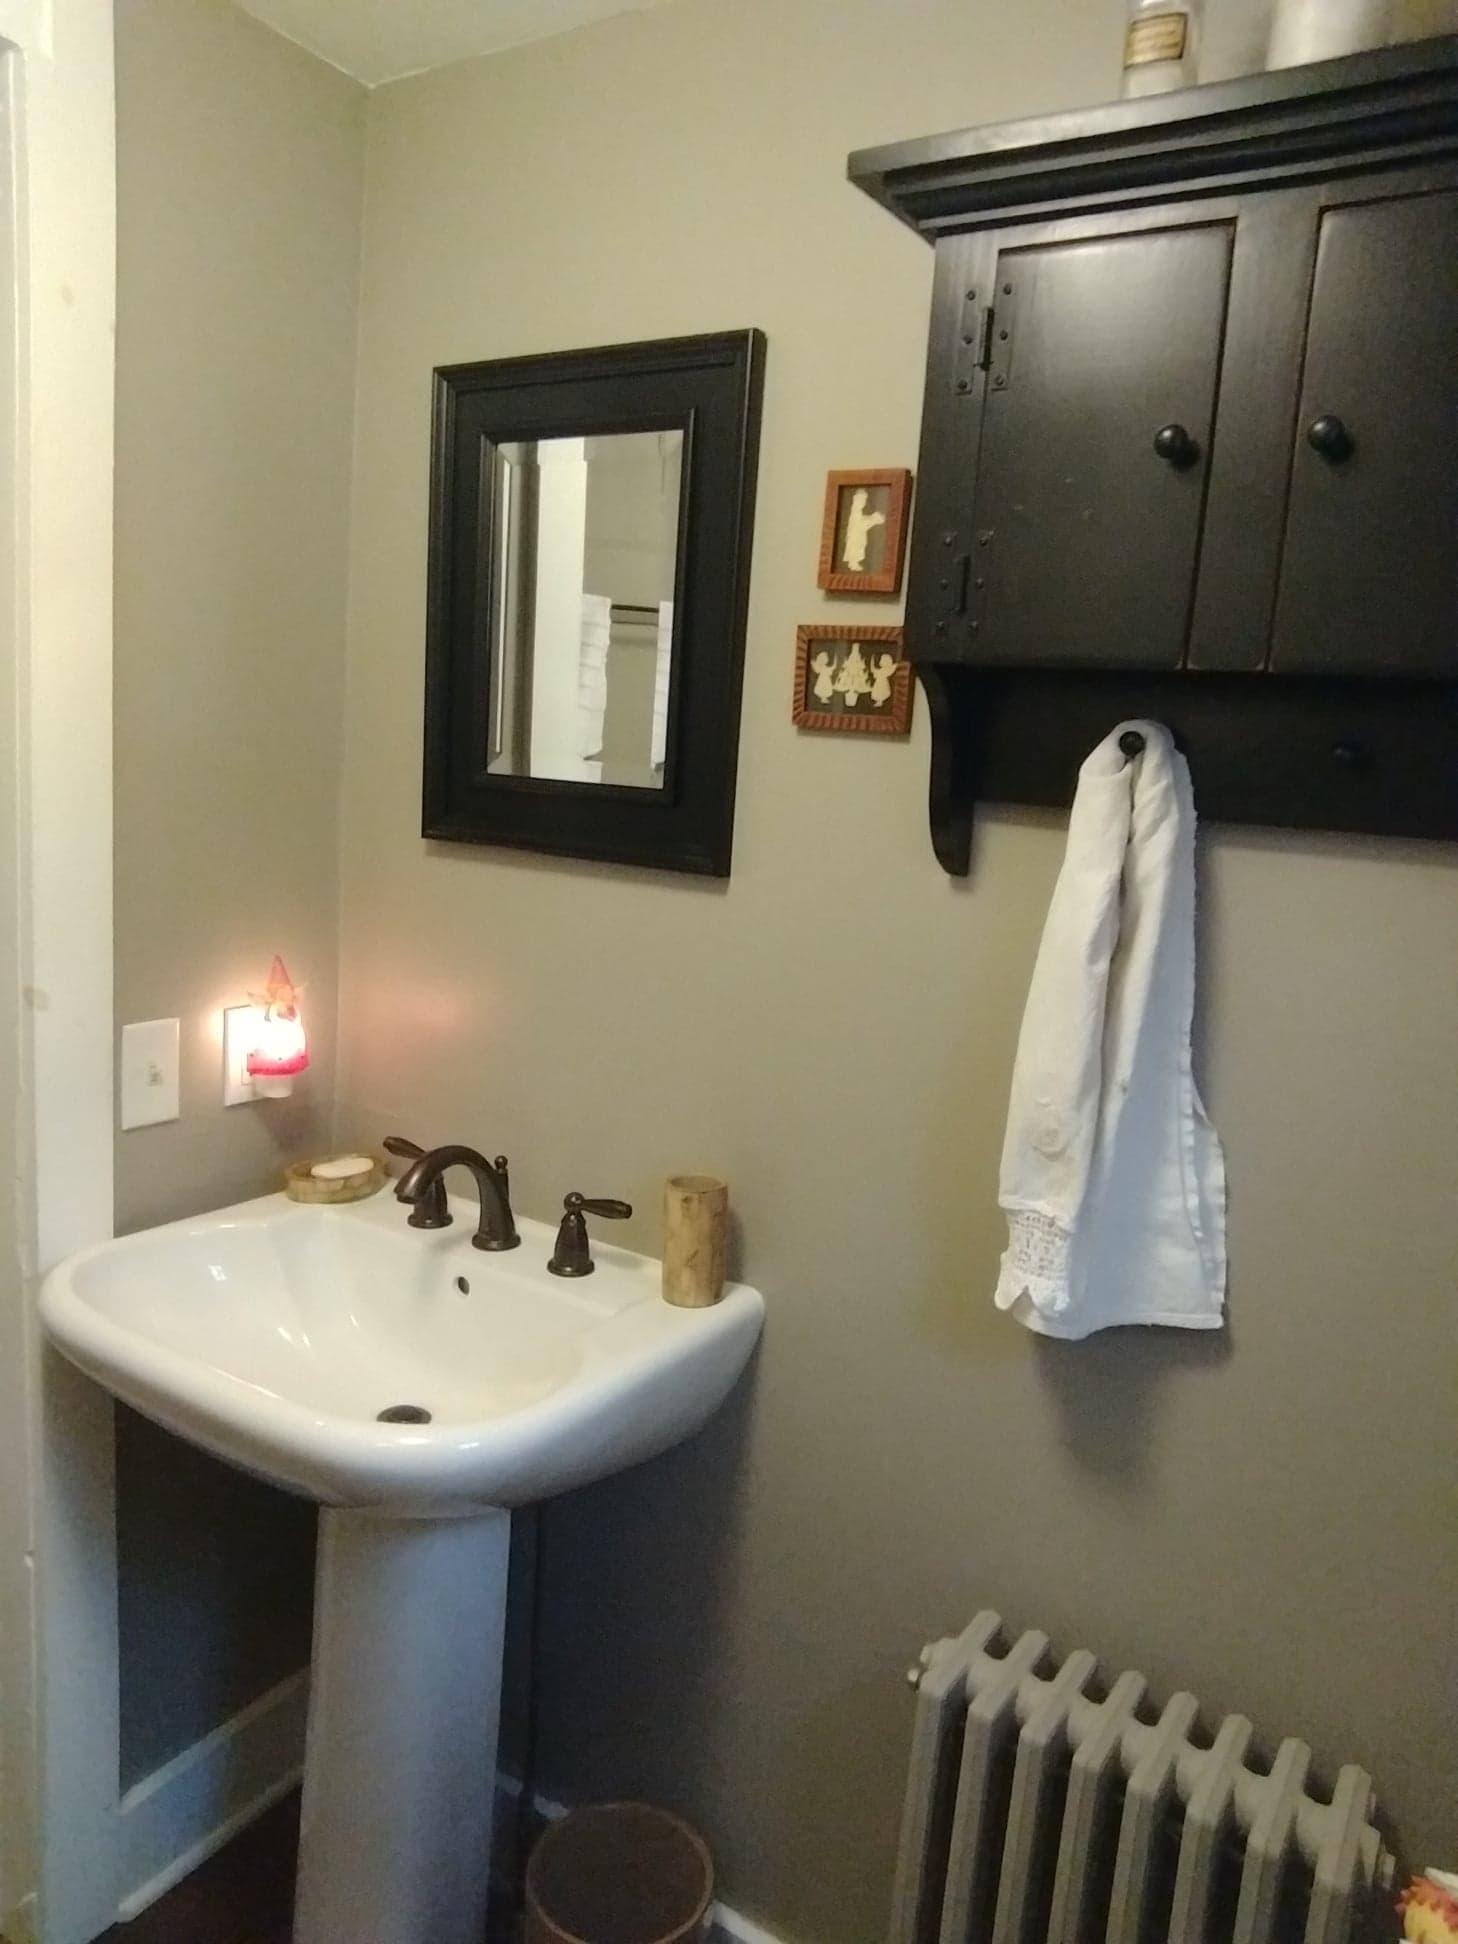 Half Bath - Sink and Cabinet